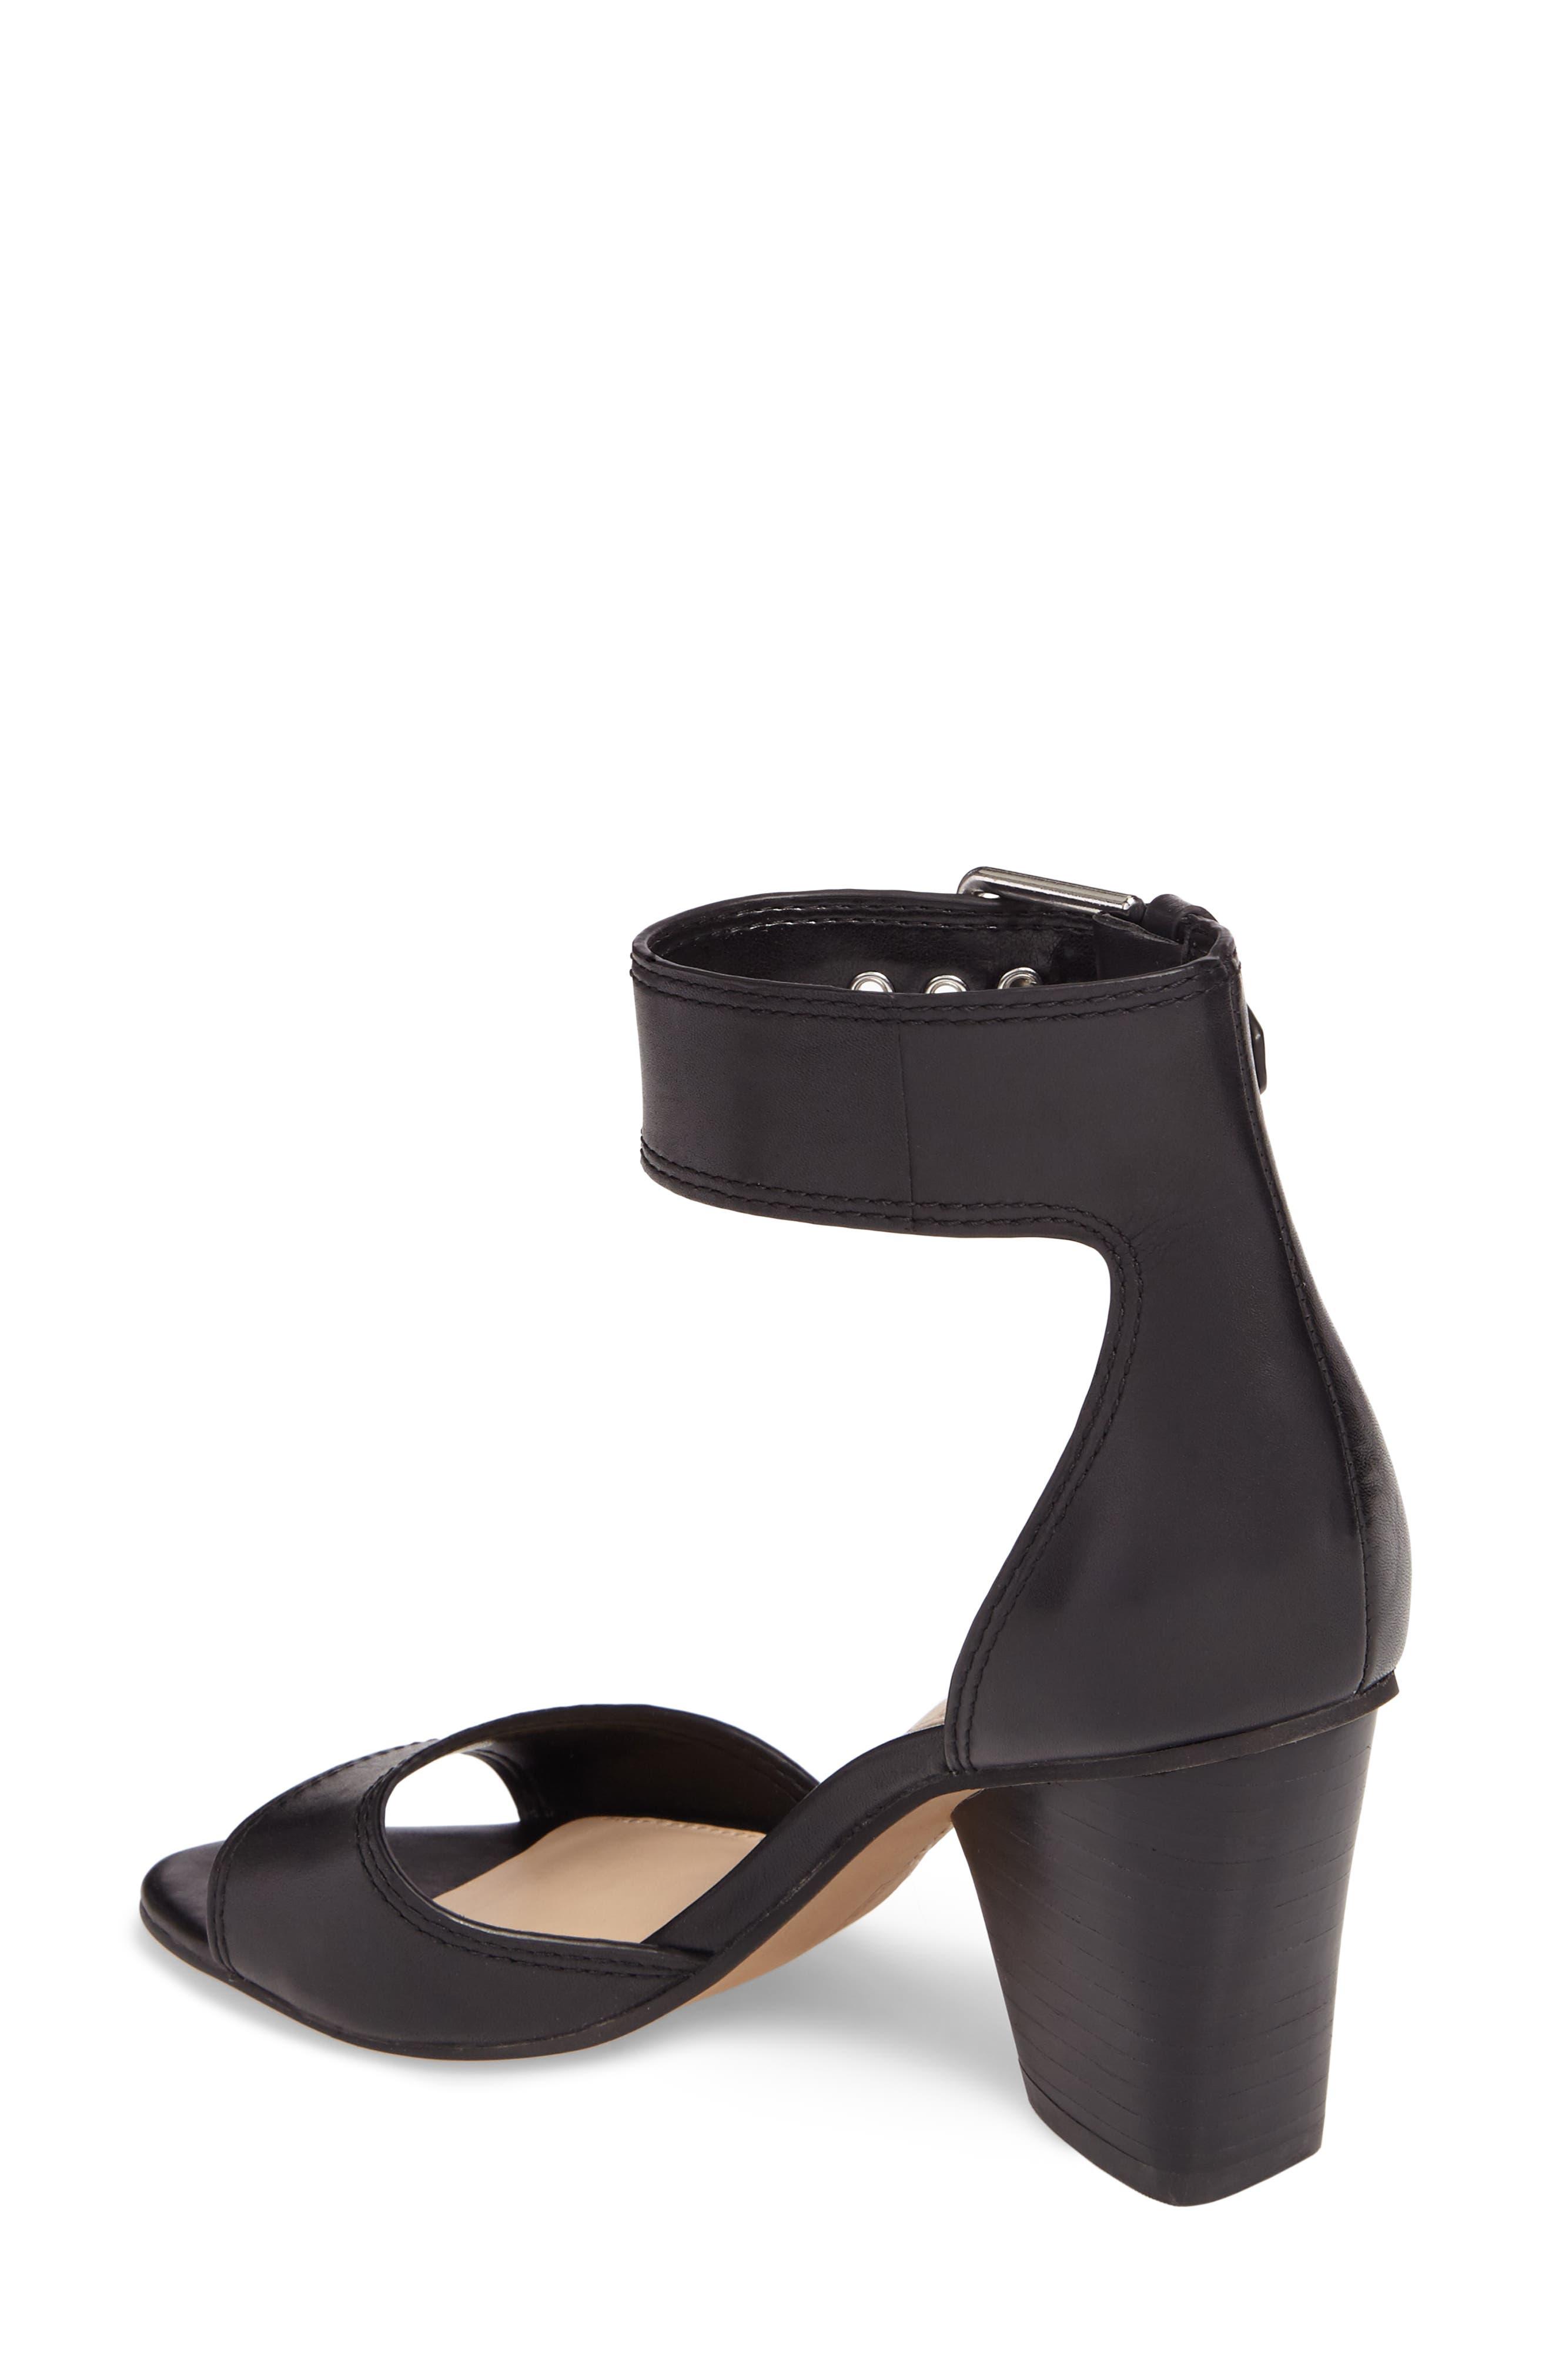 Driton Ankle Strap Sandal,                             Alternate thumbnail 2, color,                             Black Leather